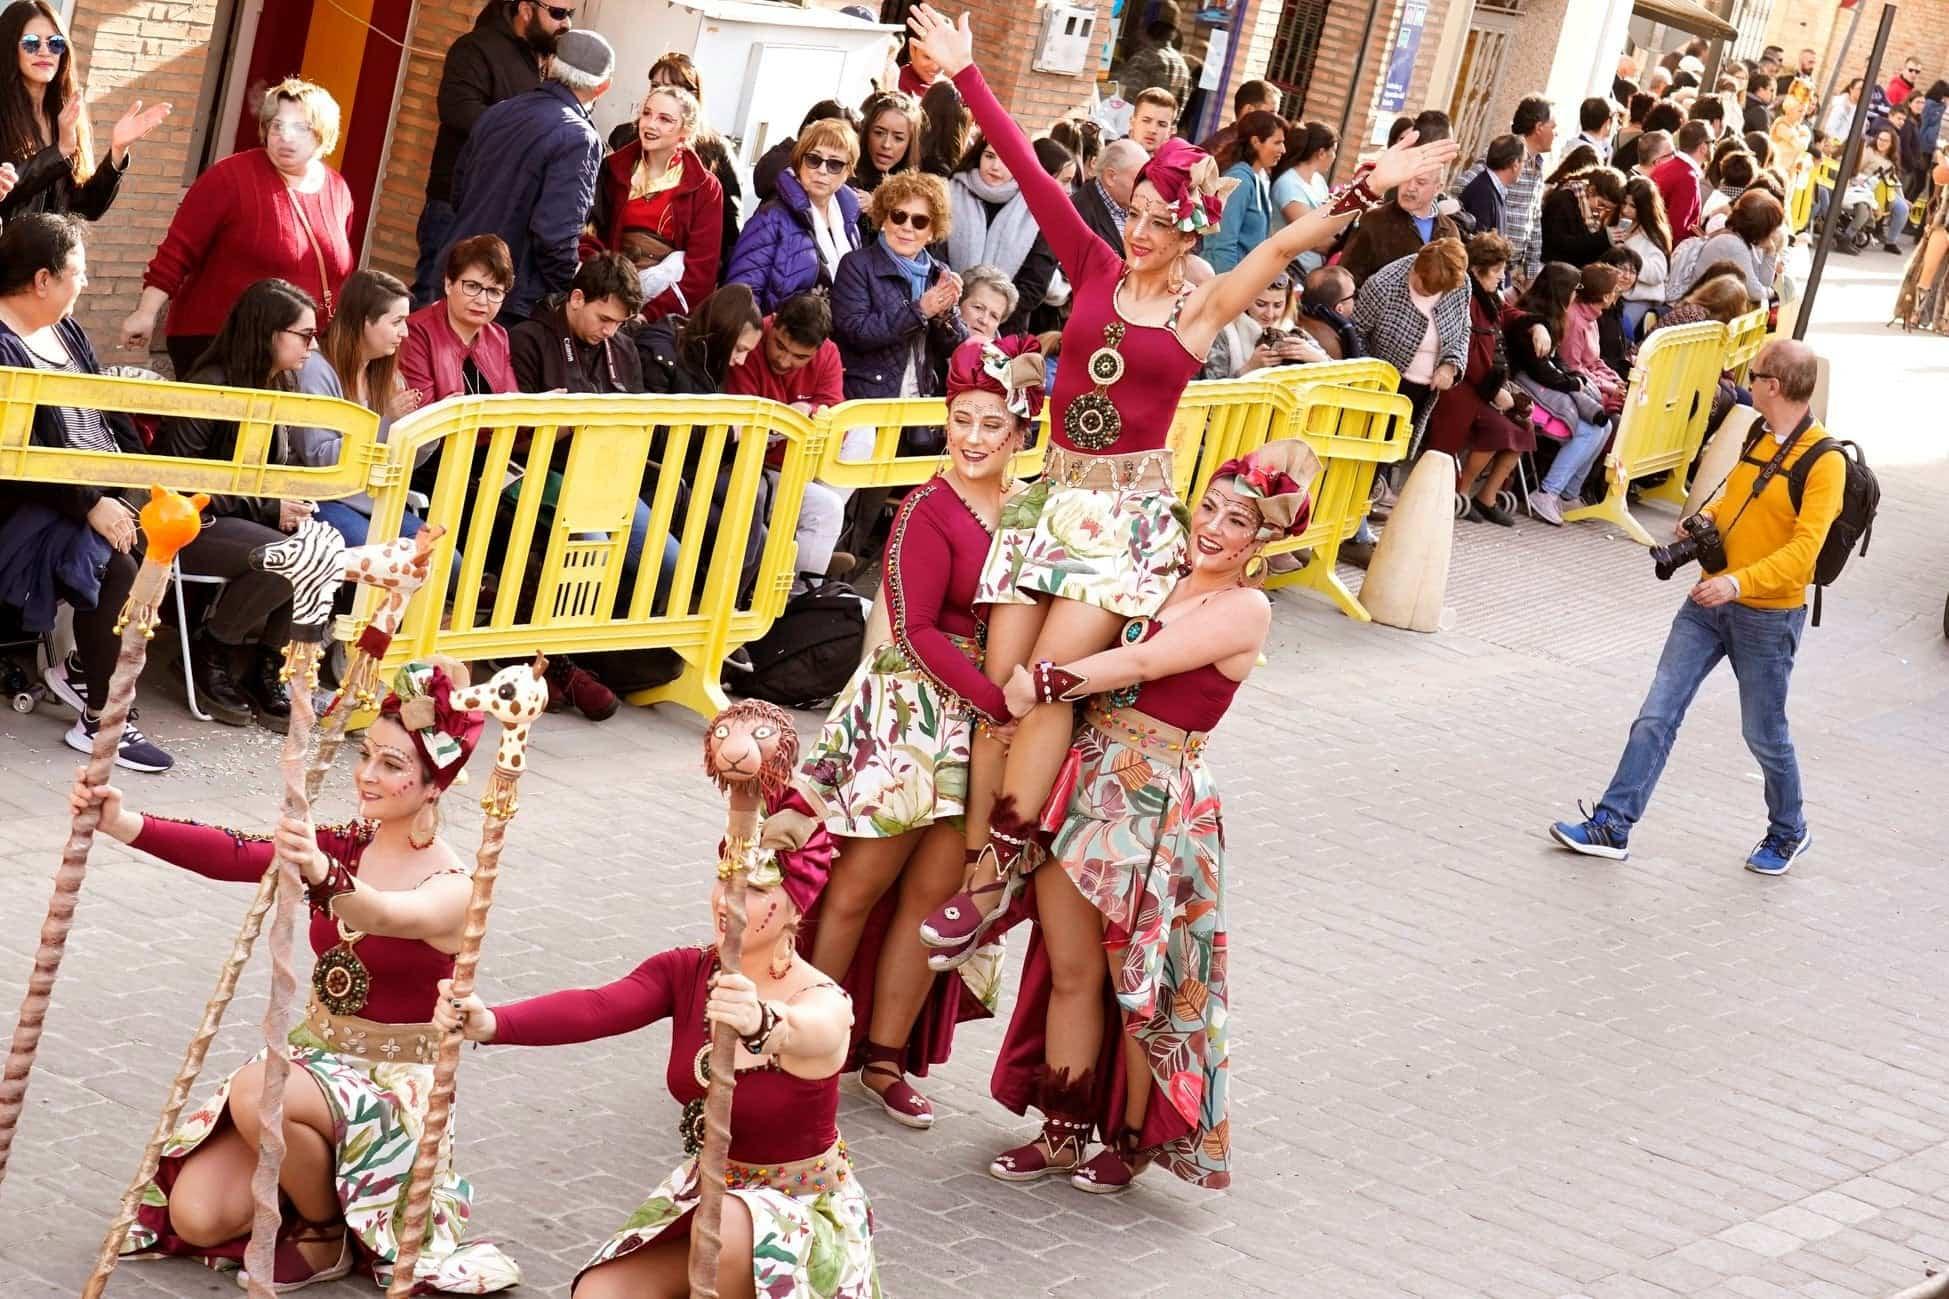 Carnaval de herencia 2020 ofertorio 101 - Selección de fotografías del Ofertorio del Carnaval de Herencia